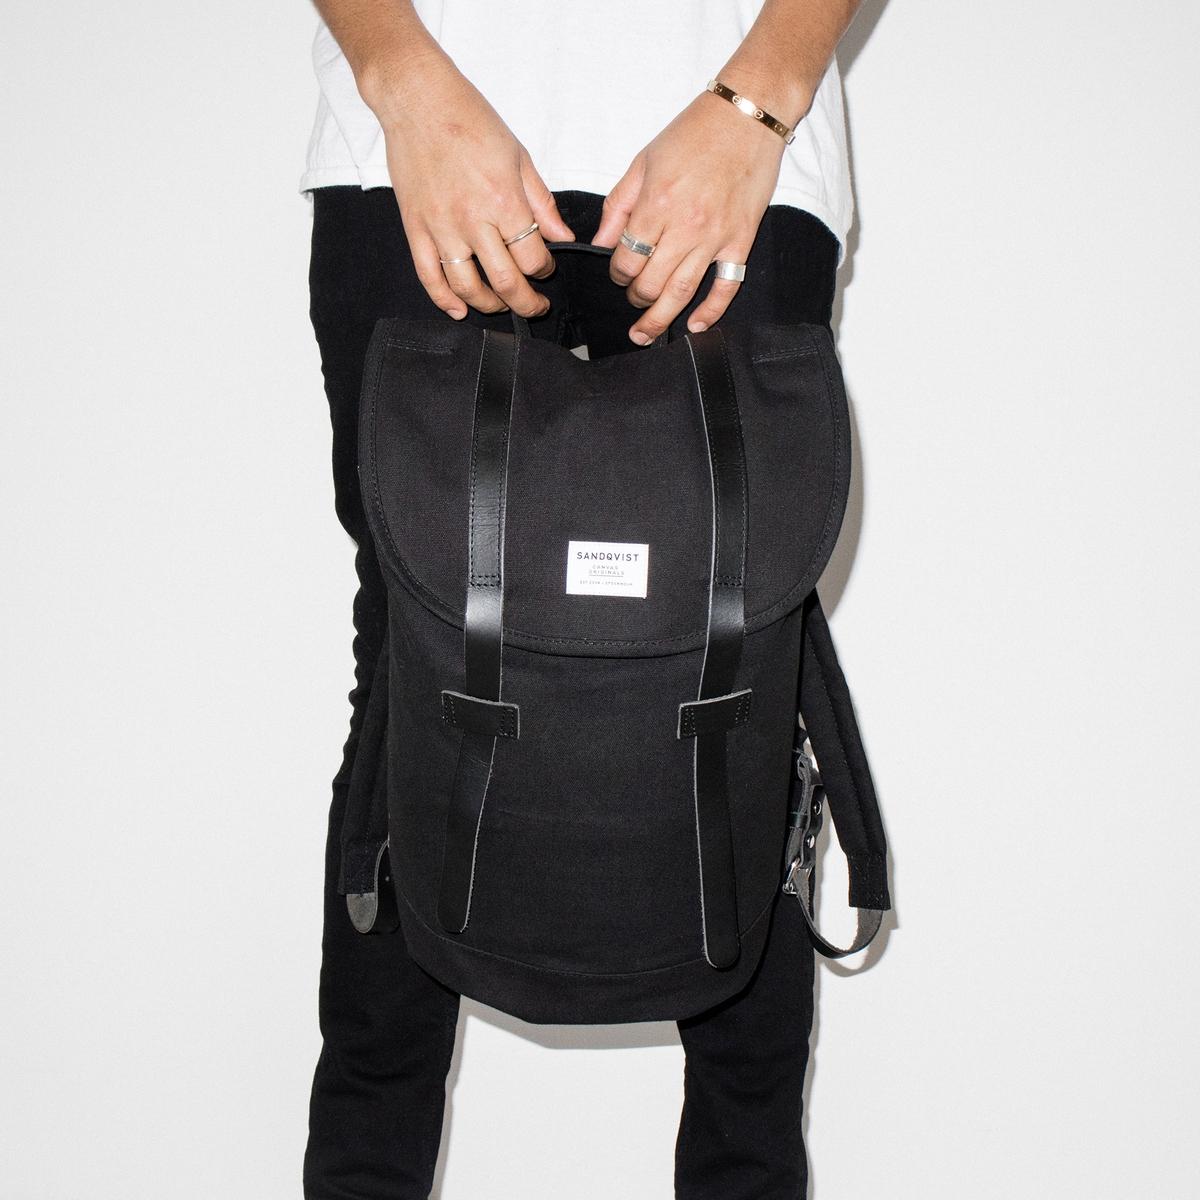 Рюкзак с отделением для компьютера 14L bcr8pm 14l bcr8pm